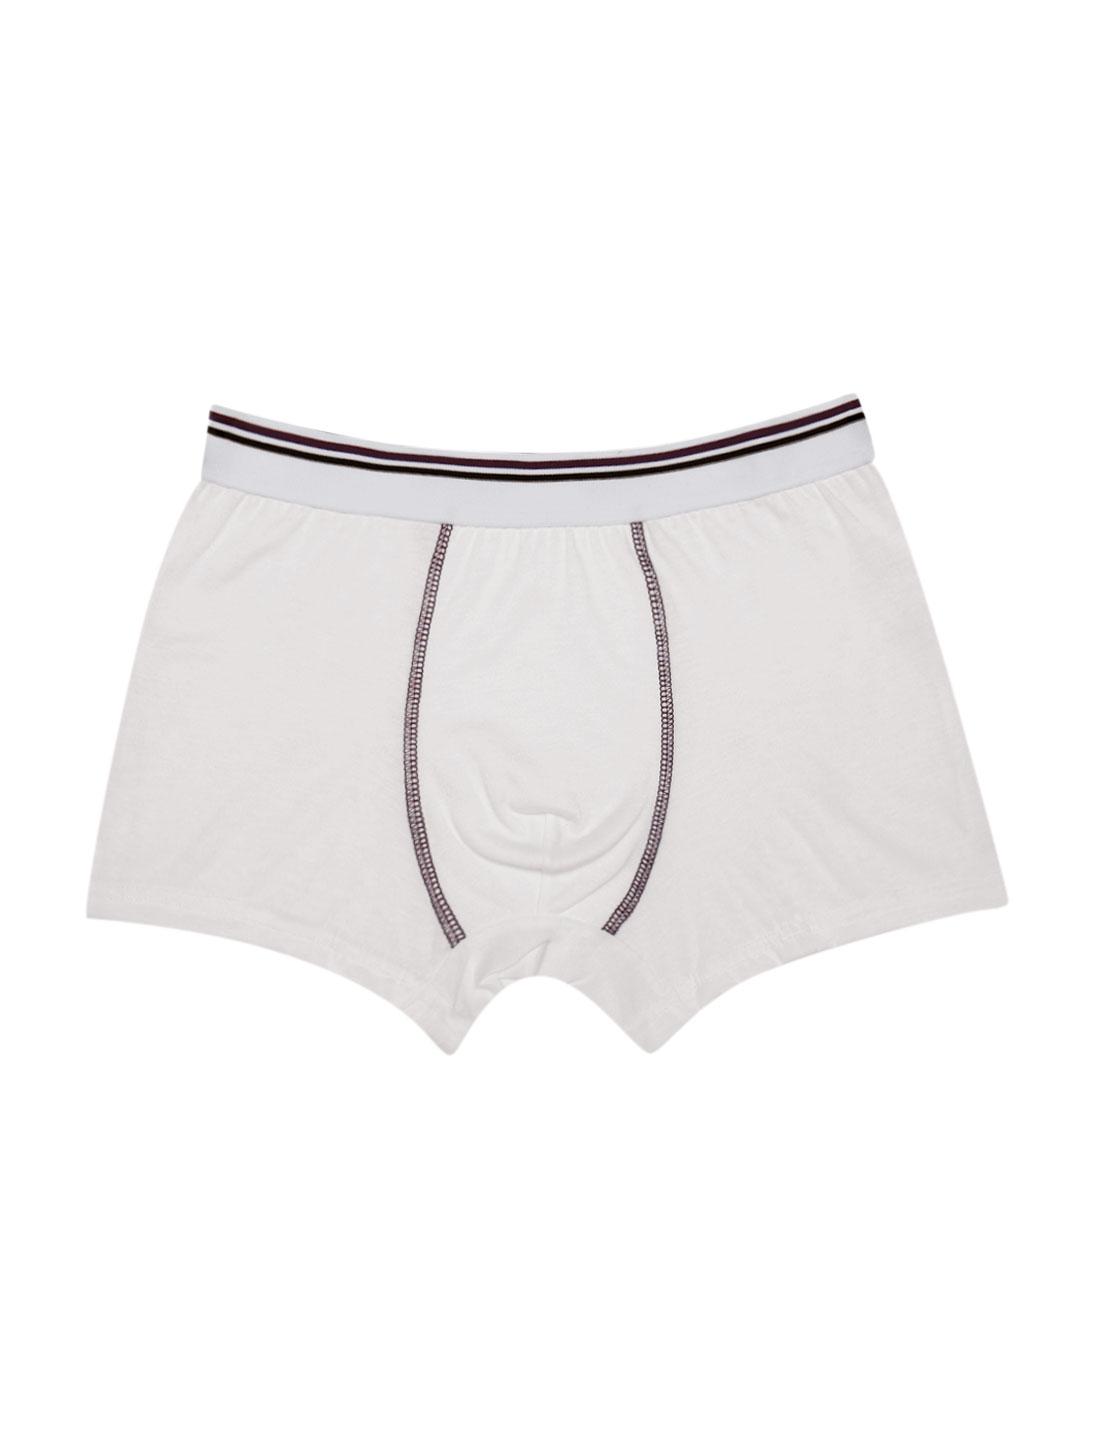 Boys Elastic Waist Stripes Boxer Brief 1 Pack White L